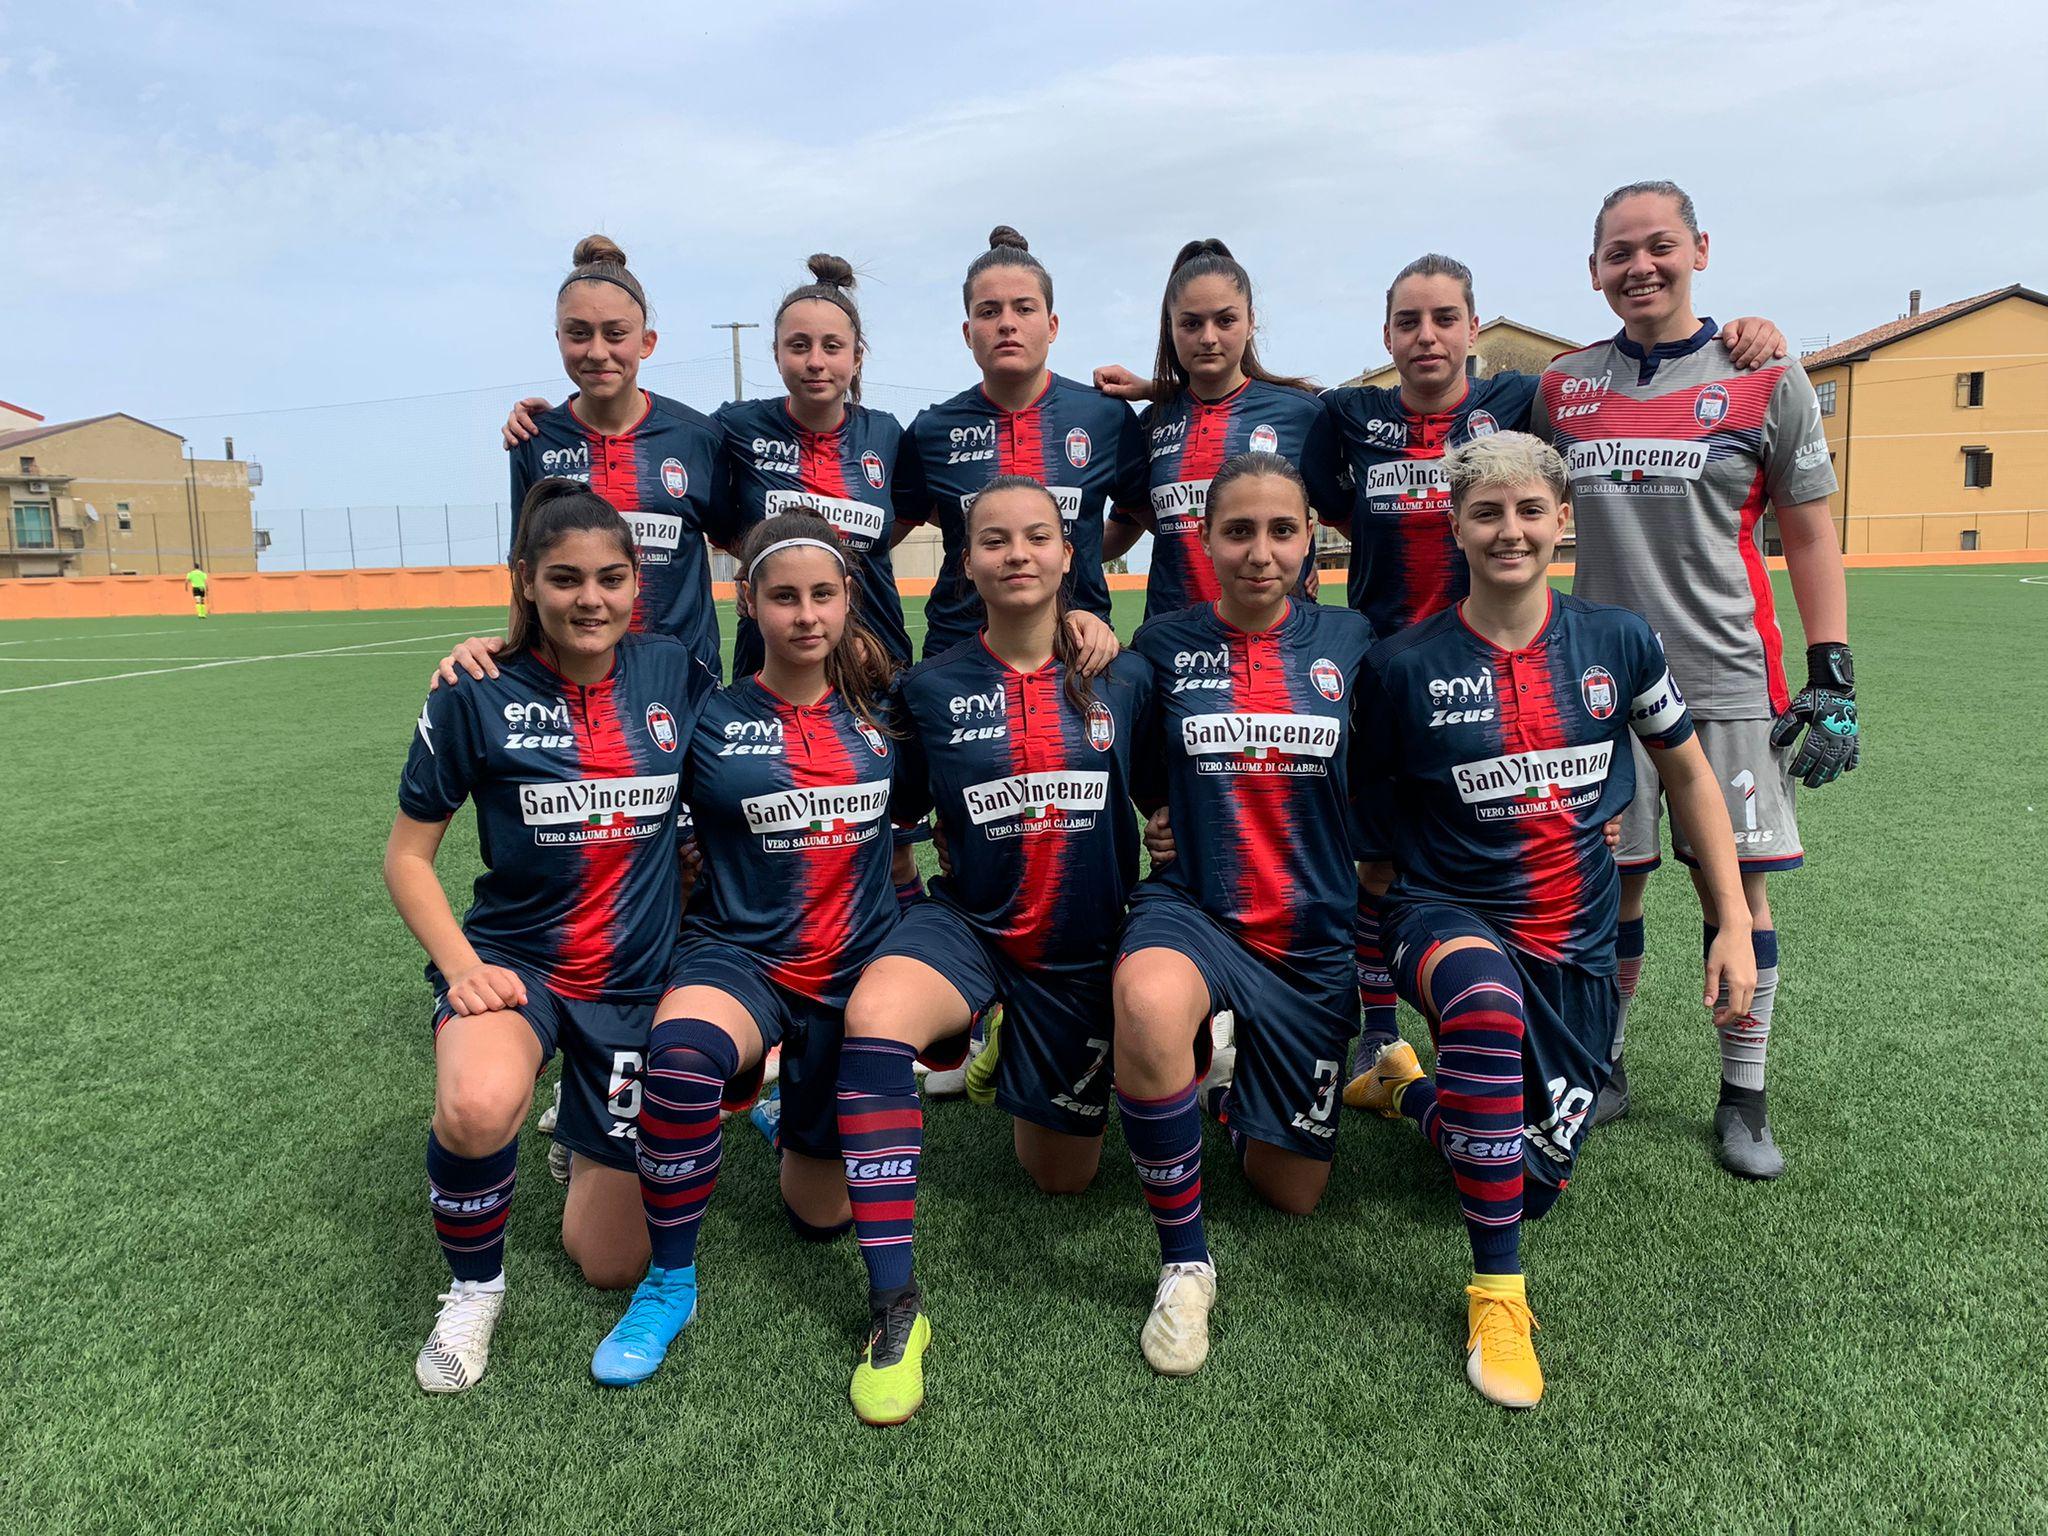 Femminile Serie C, 16ª giornata: Crotone-Palermo 1-6